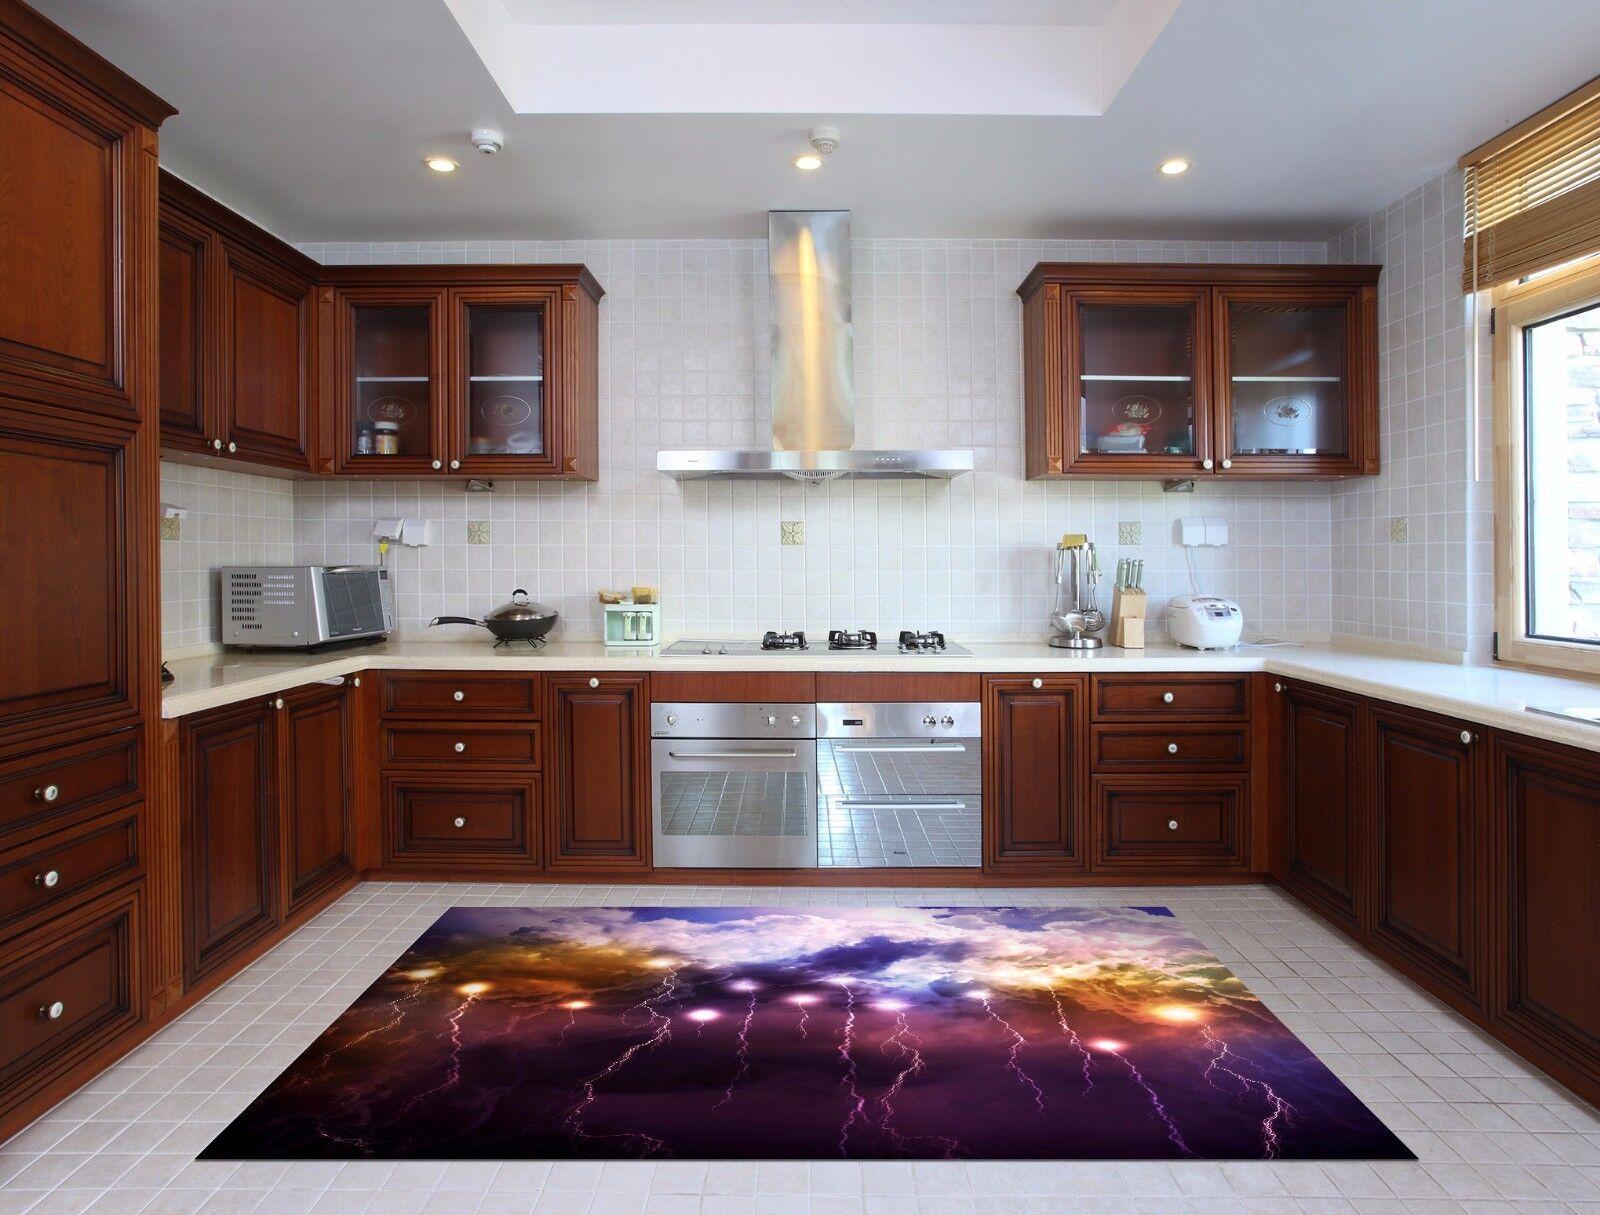 3D Lightning 853 Kitchen Mat Floor Murals Wall Print Wall Deco AJ WALLPAPER UK